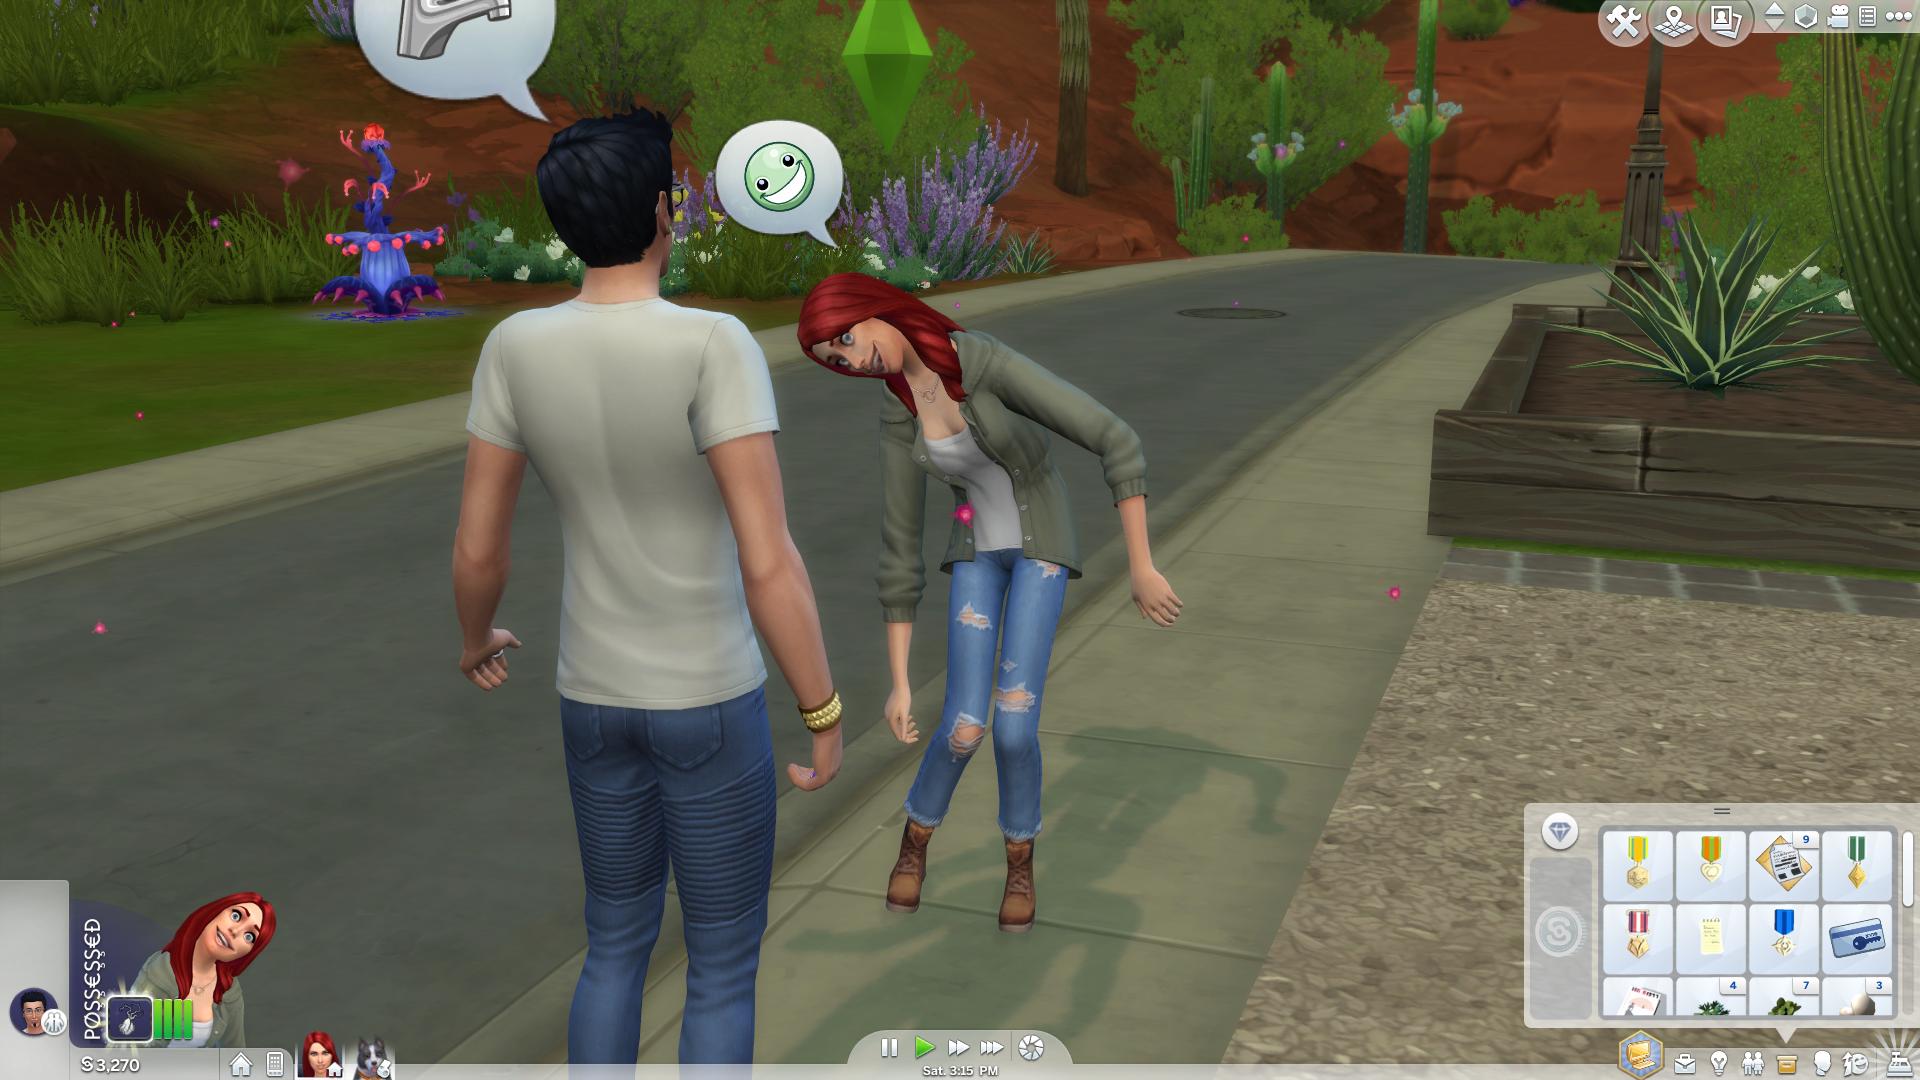 The Sims 4: StrangerVille finally makes the series weird